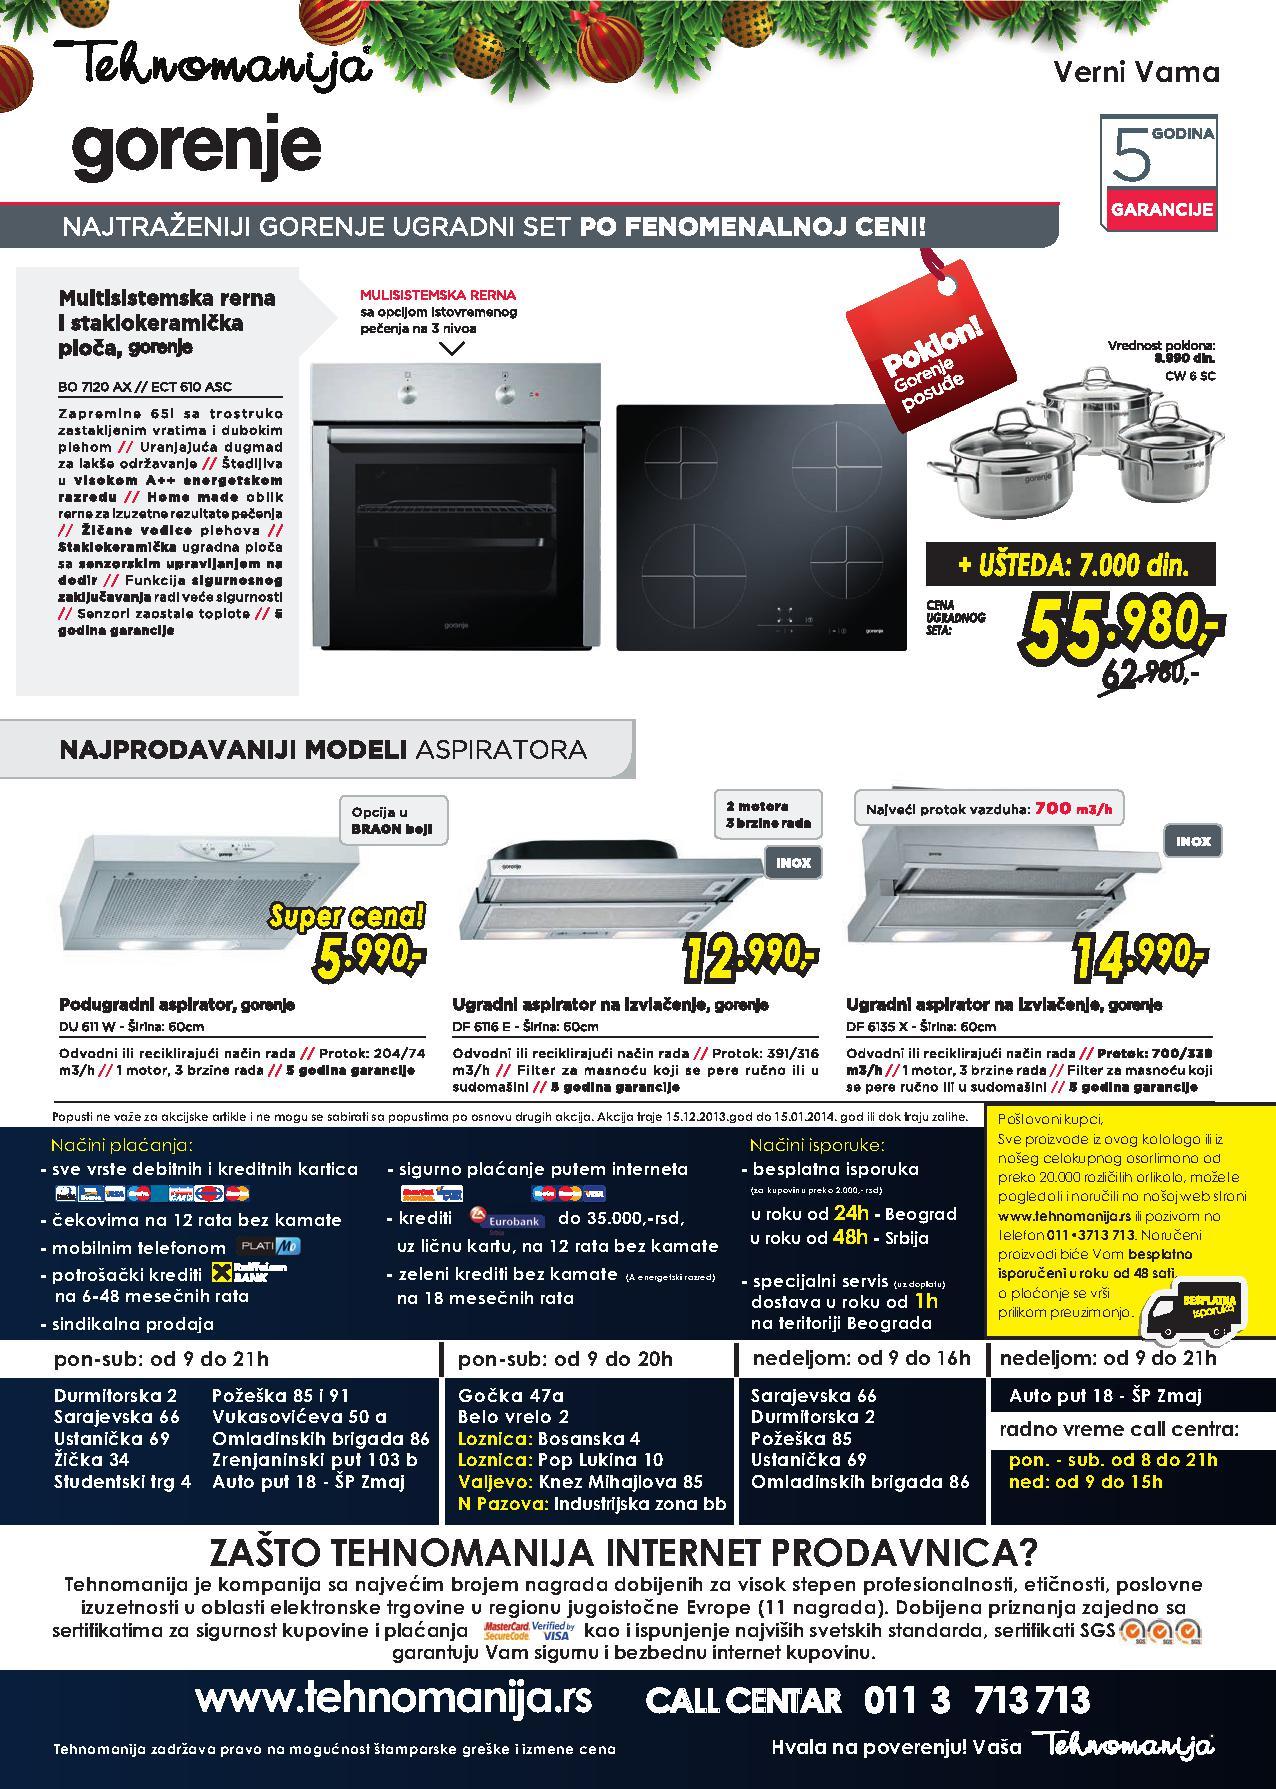 Tehnomanija katalog Gorenje proizvodi po super ceni